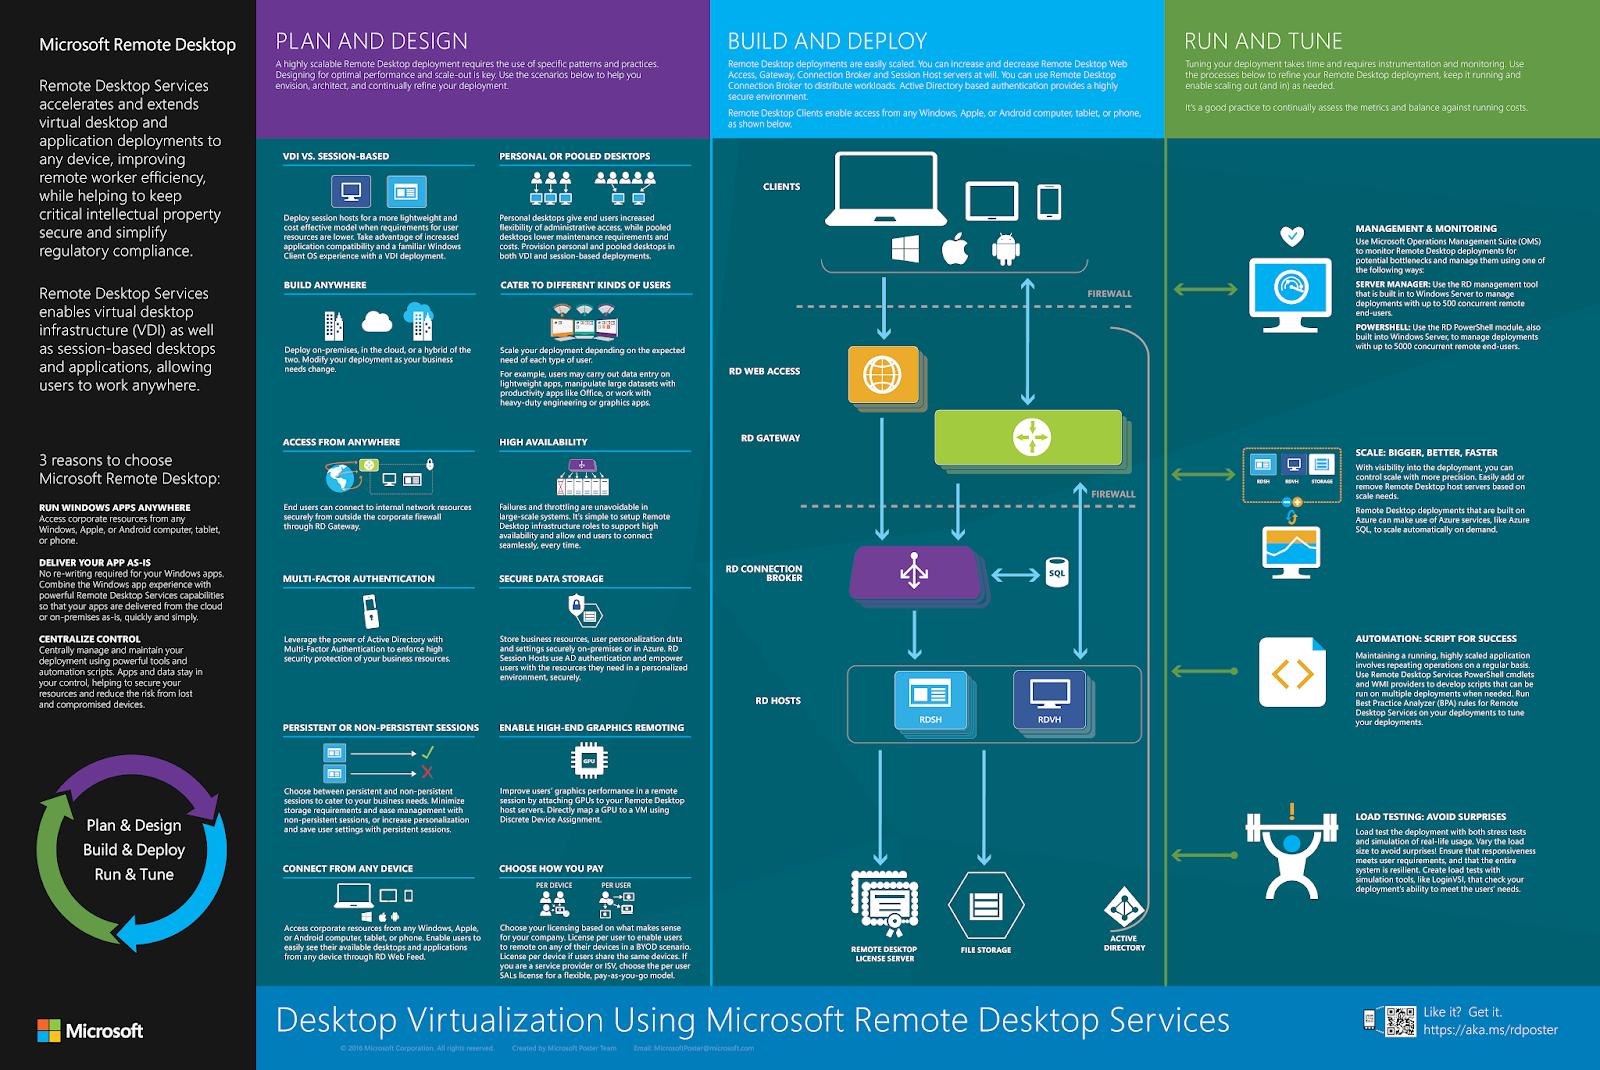 Windows Server 2019 (Version: 10 0 17763) and SQL server 2019 ~ DBA